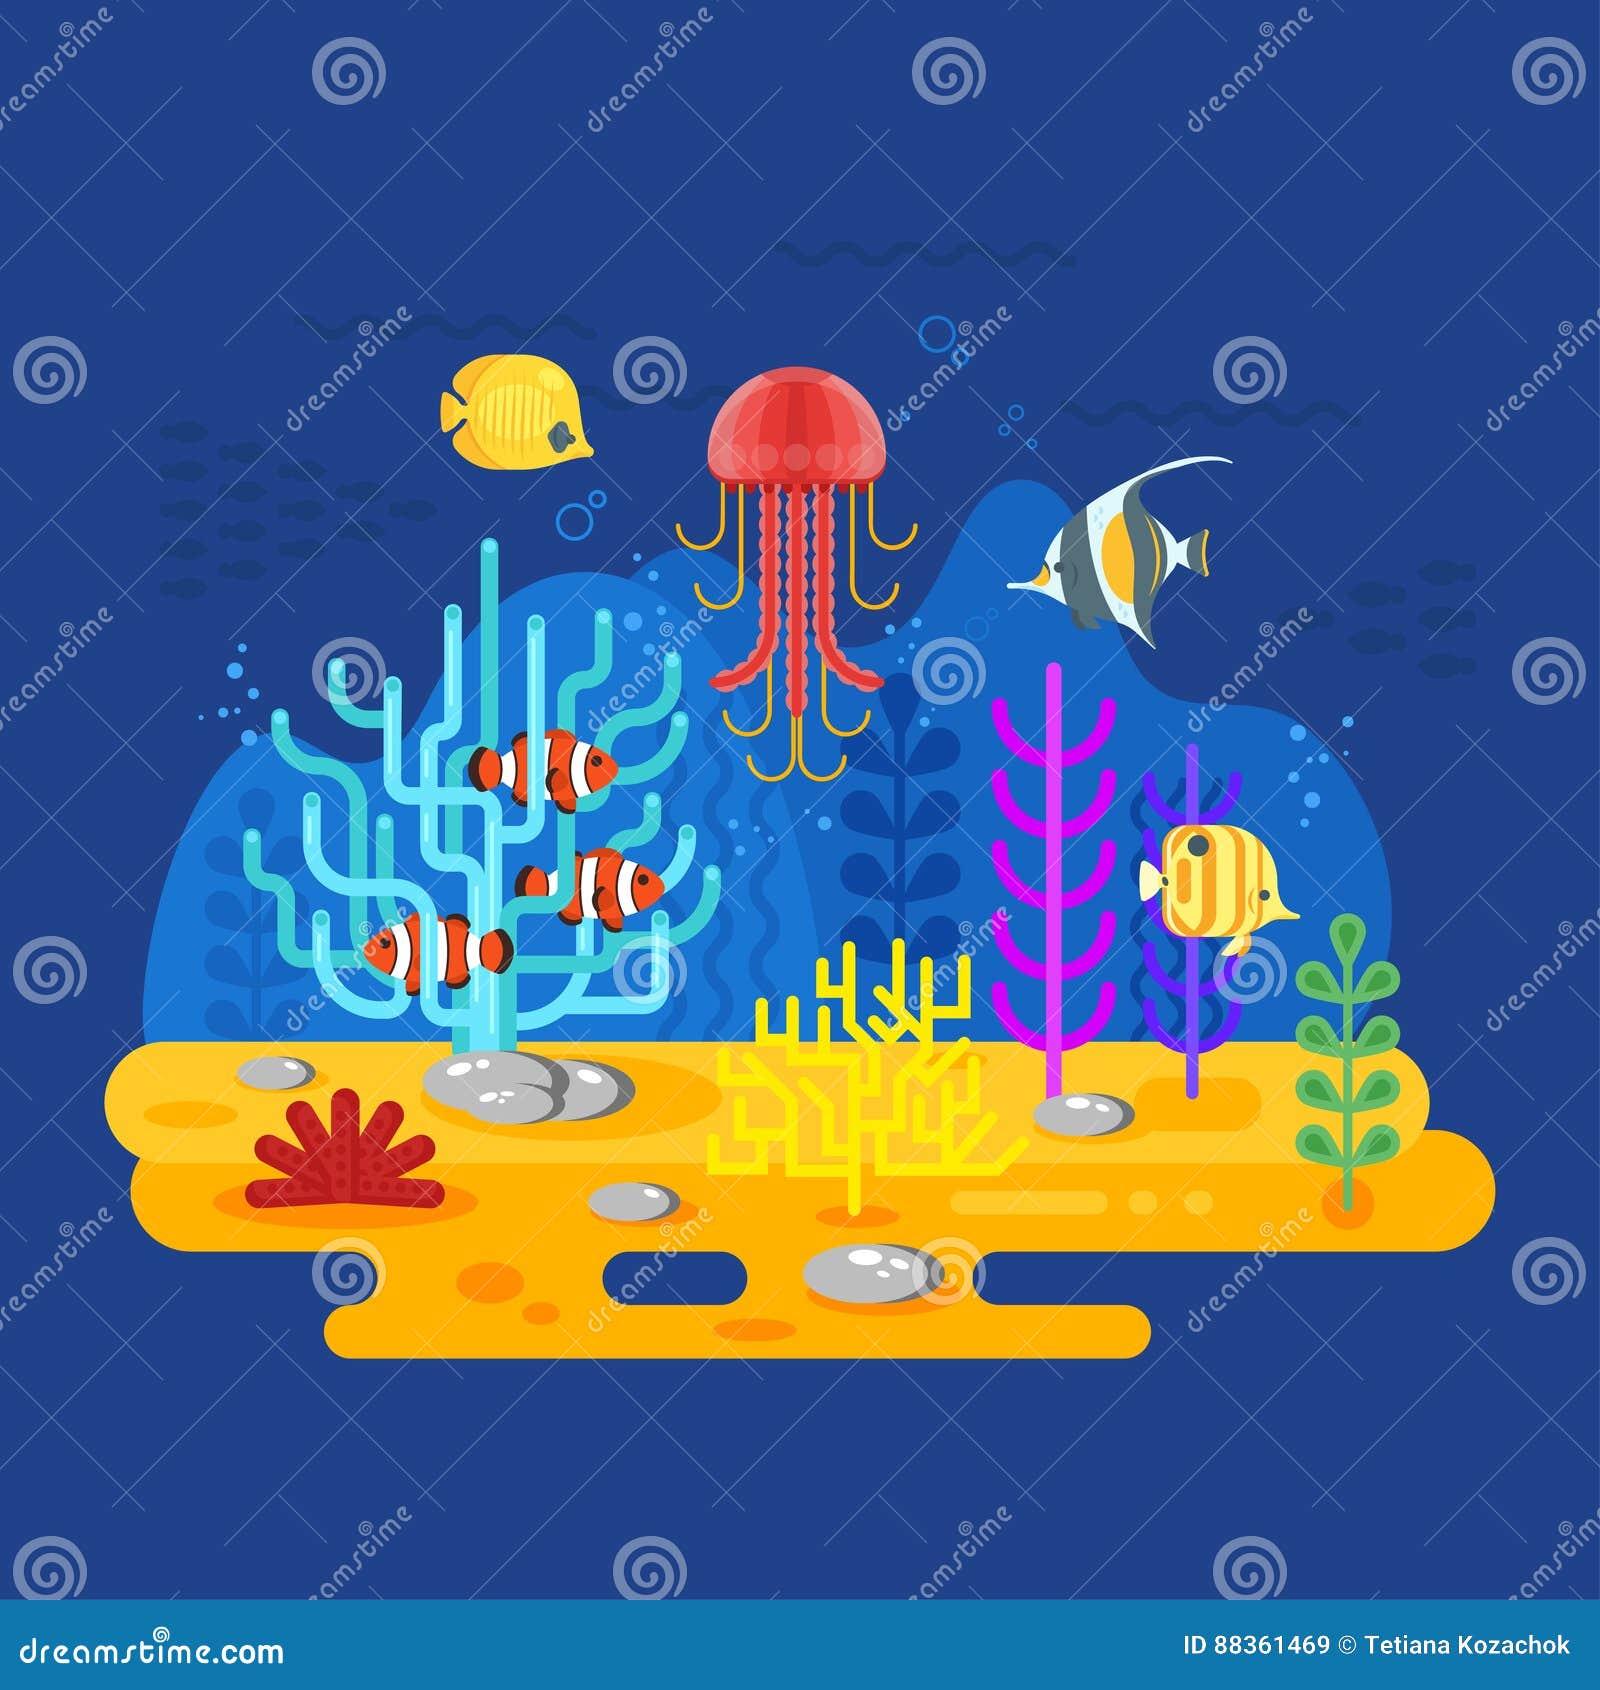 icon reef fish cartoon vector cartoondealercom 89656893